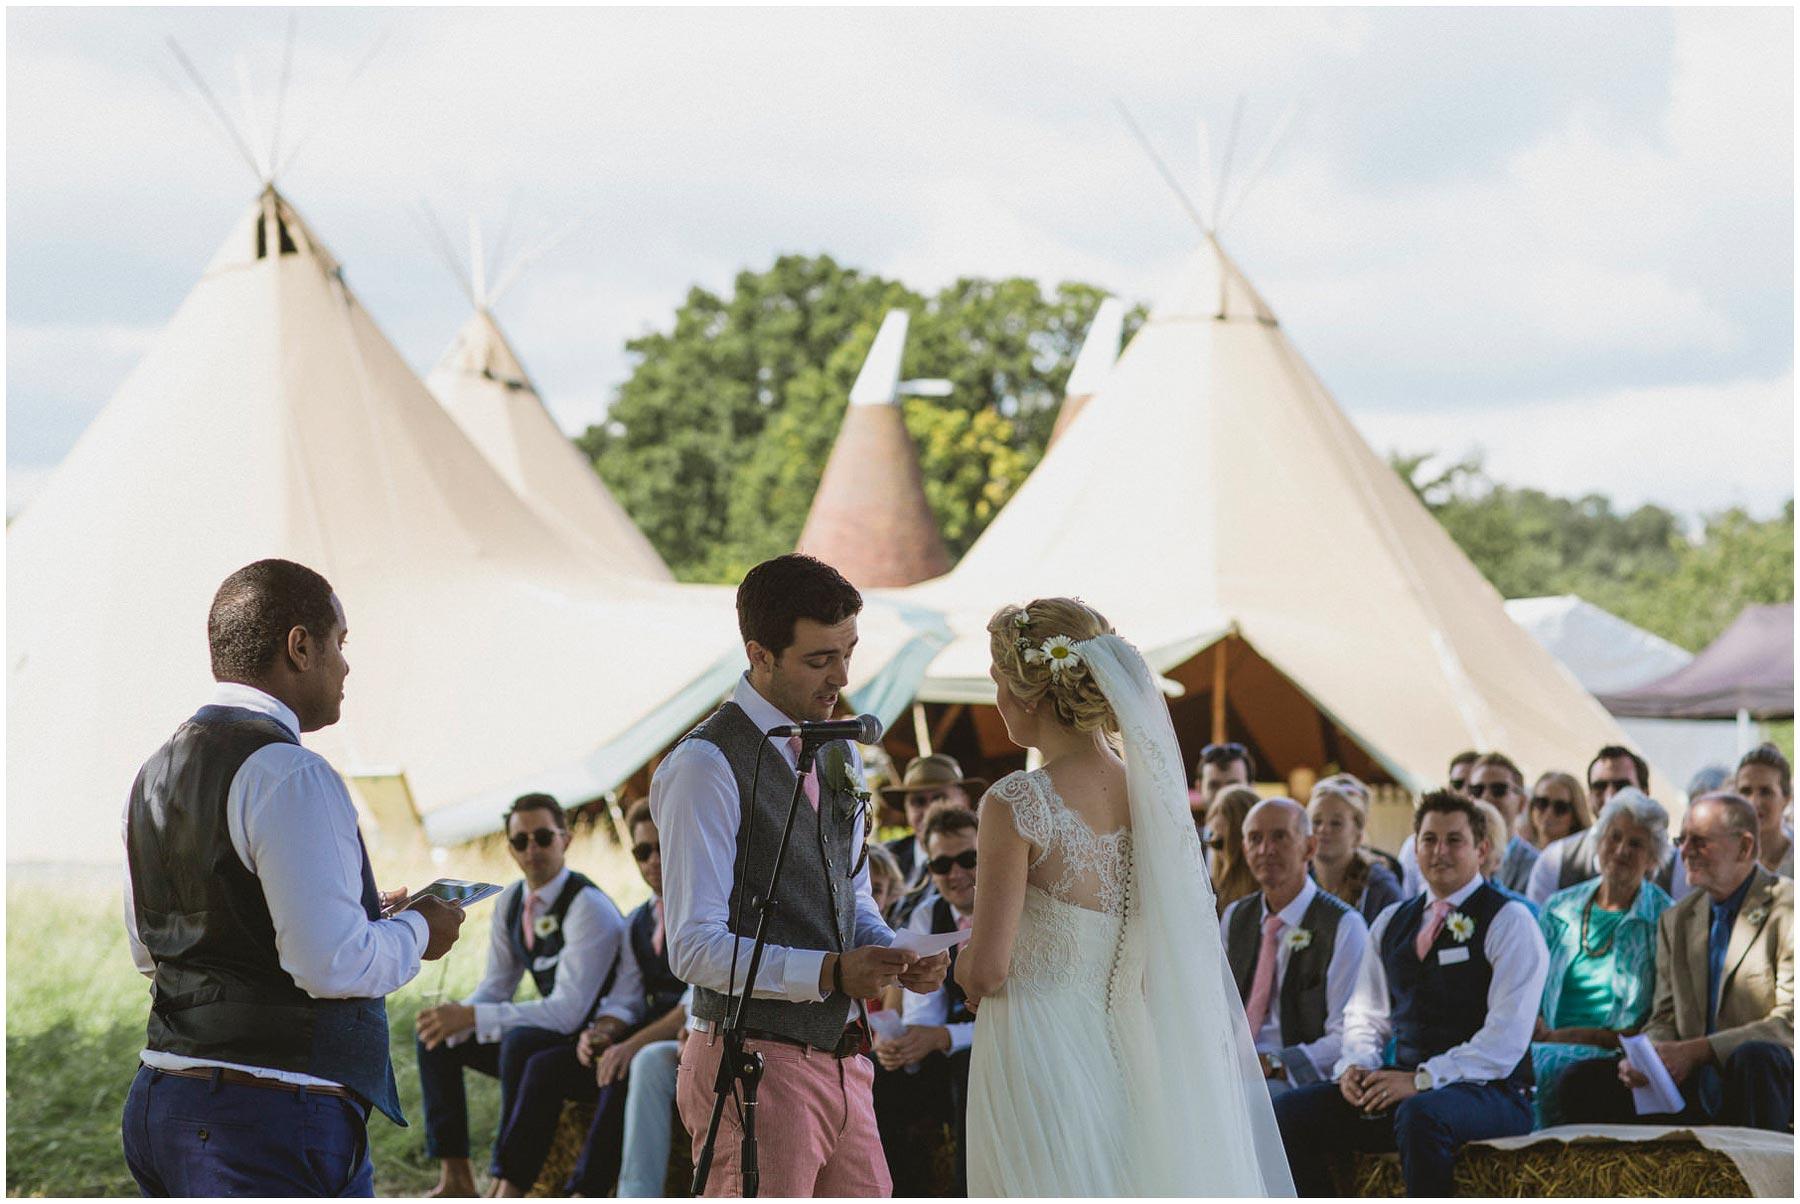 Kent-Festival-Tipi-wedding-photography_0067